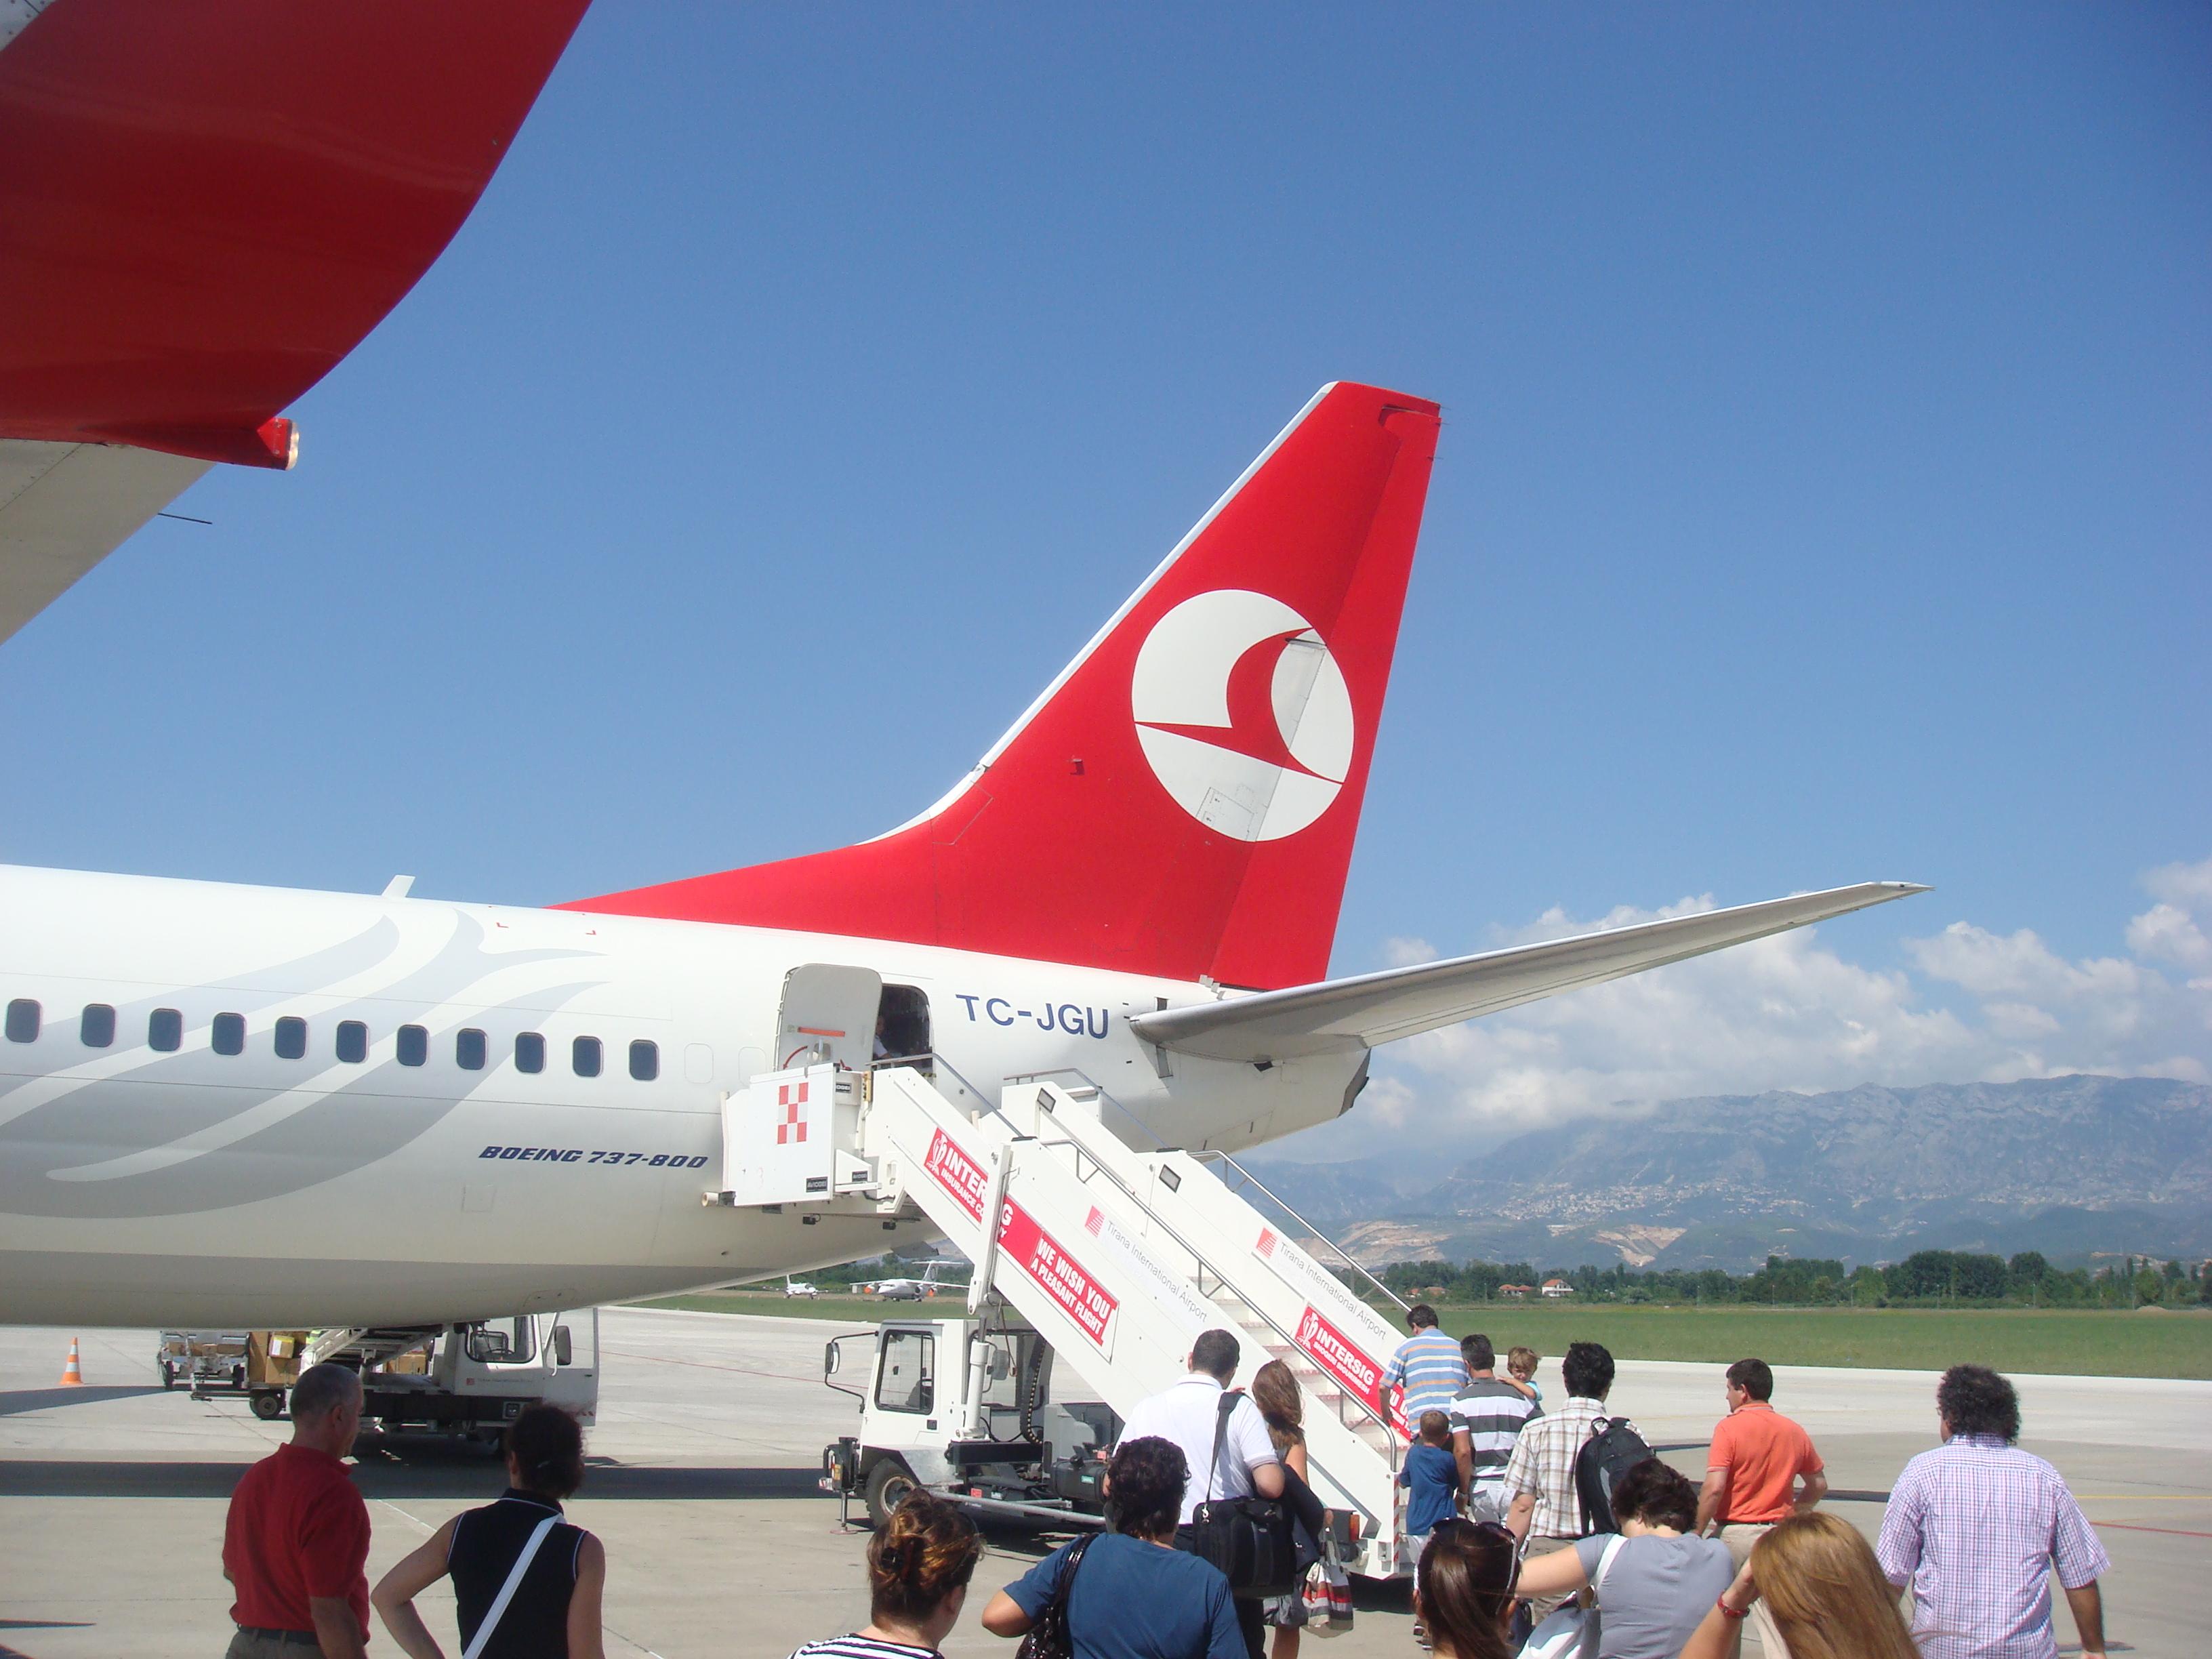 https://upload.wikimedia.org/wikipedia/commons/f/f0/Turkish_Airline.JPG